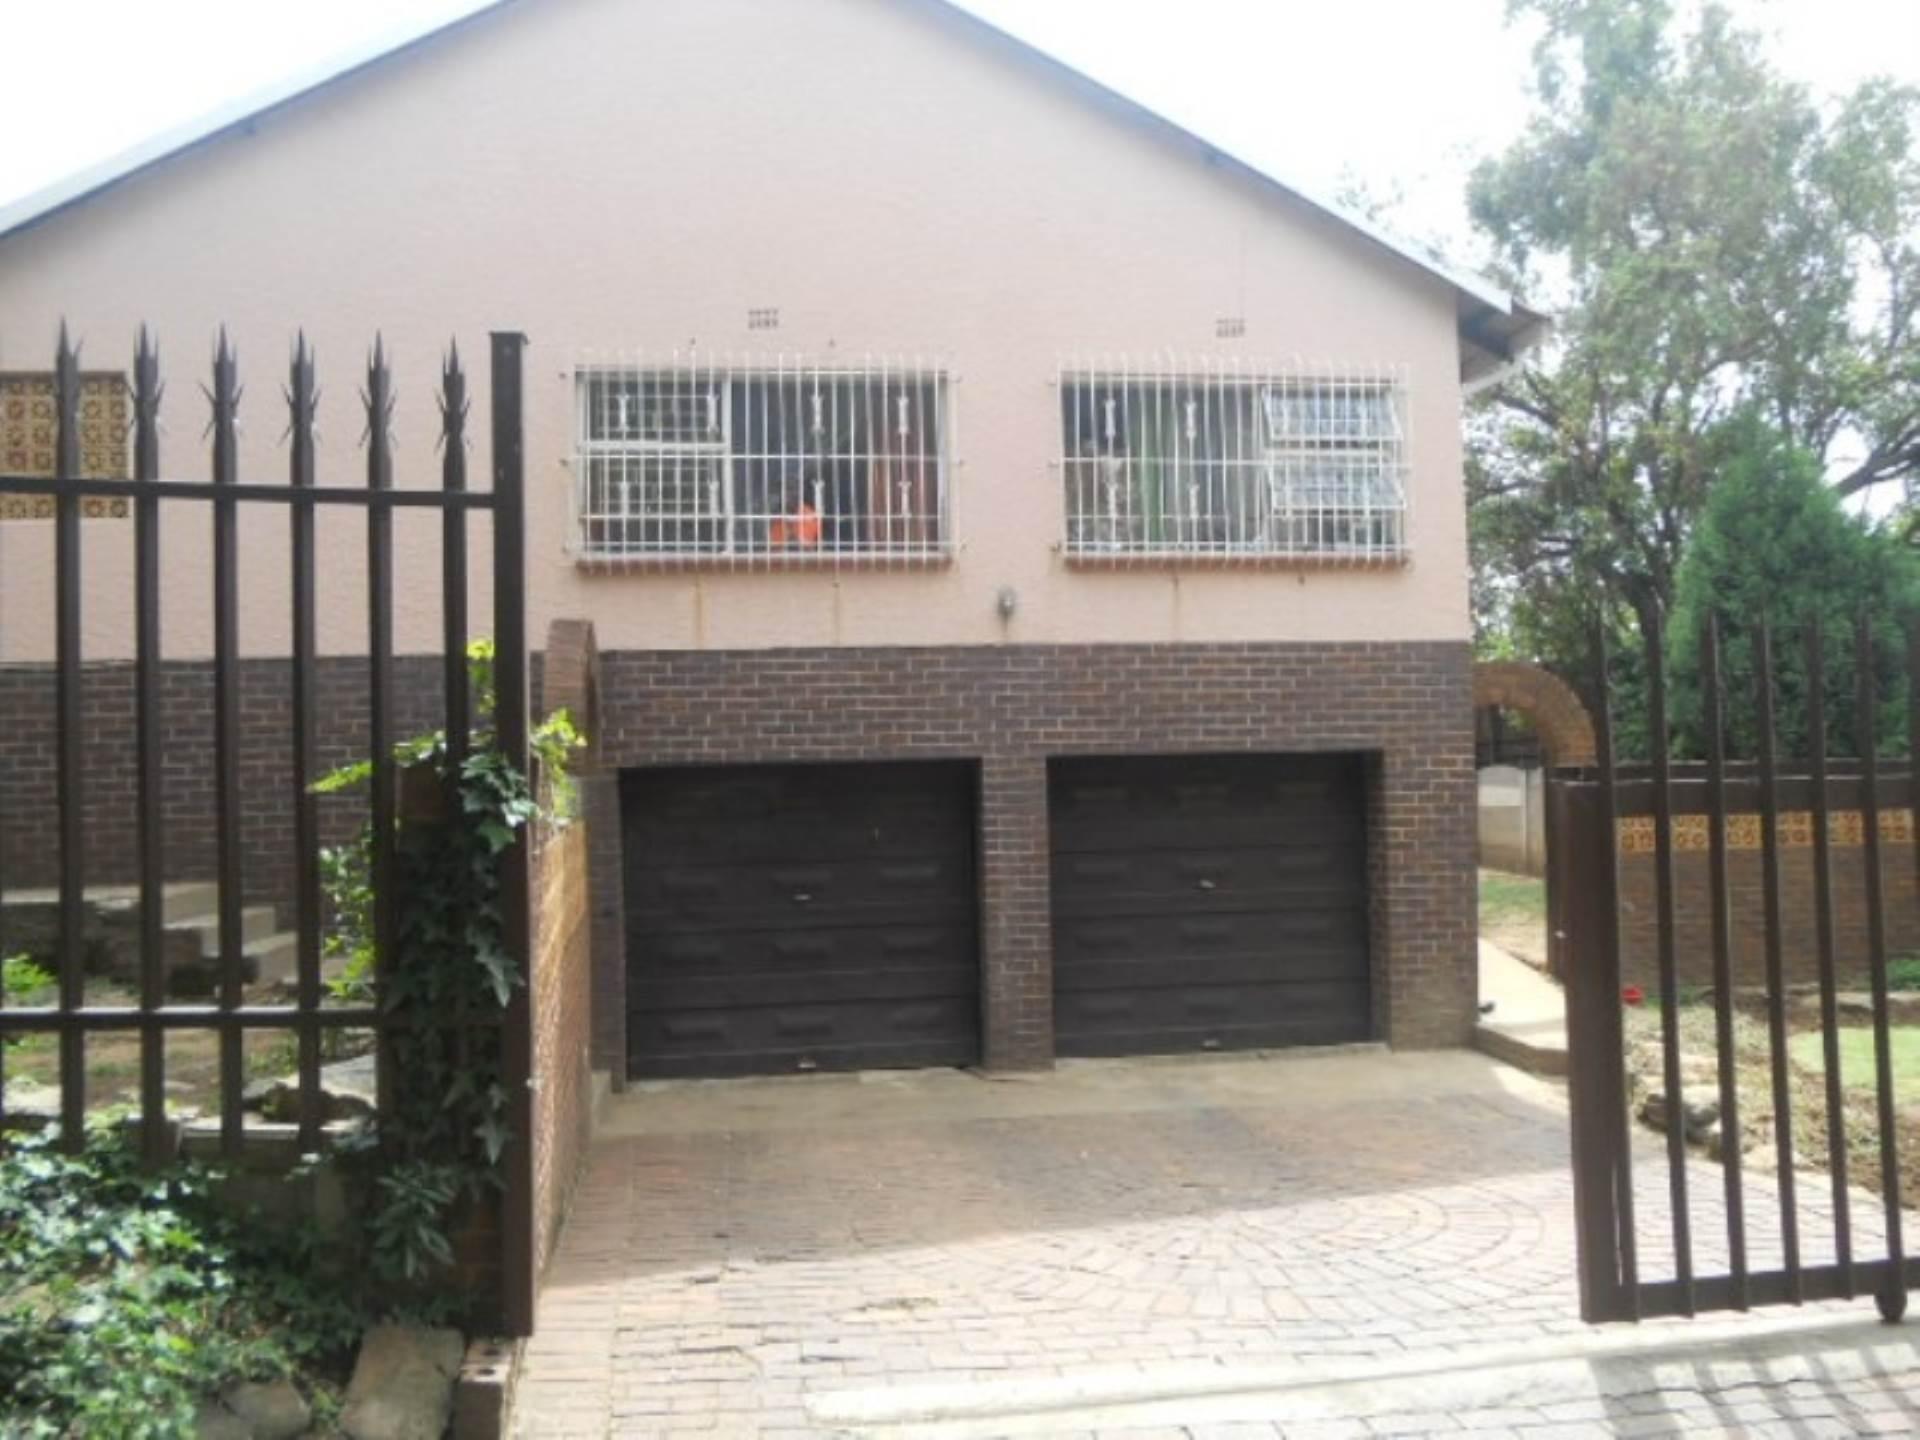 4 BedroomHouse To Rent In Edenvale